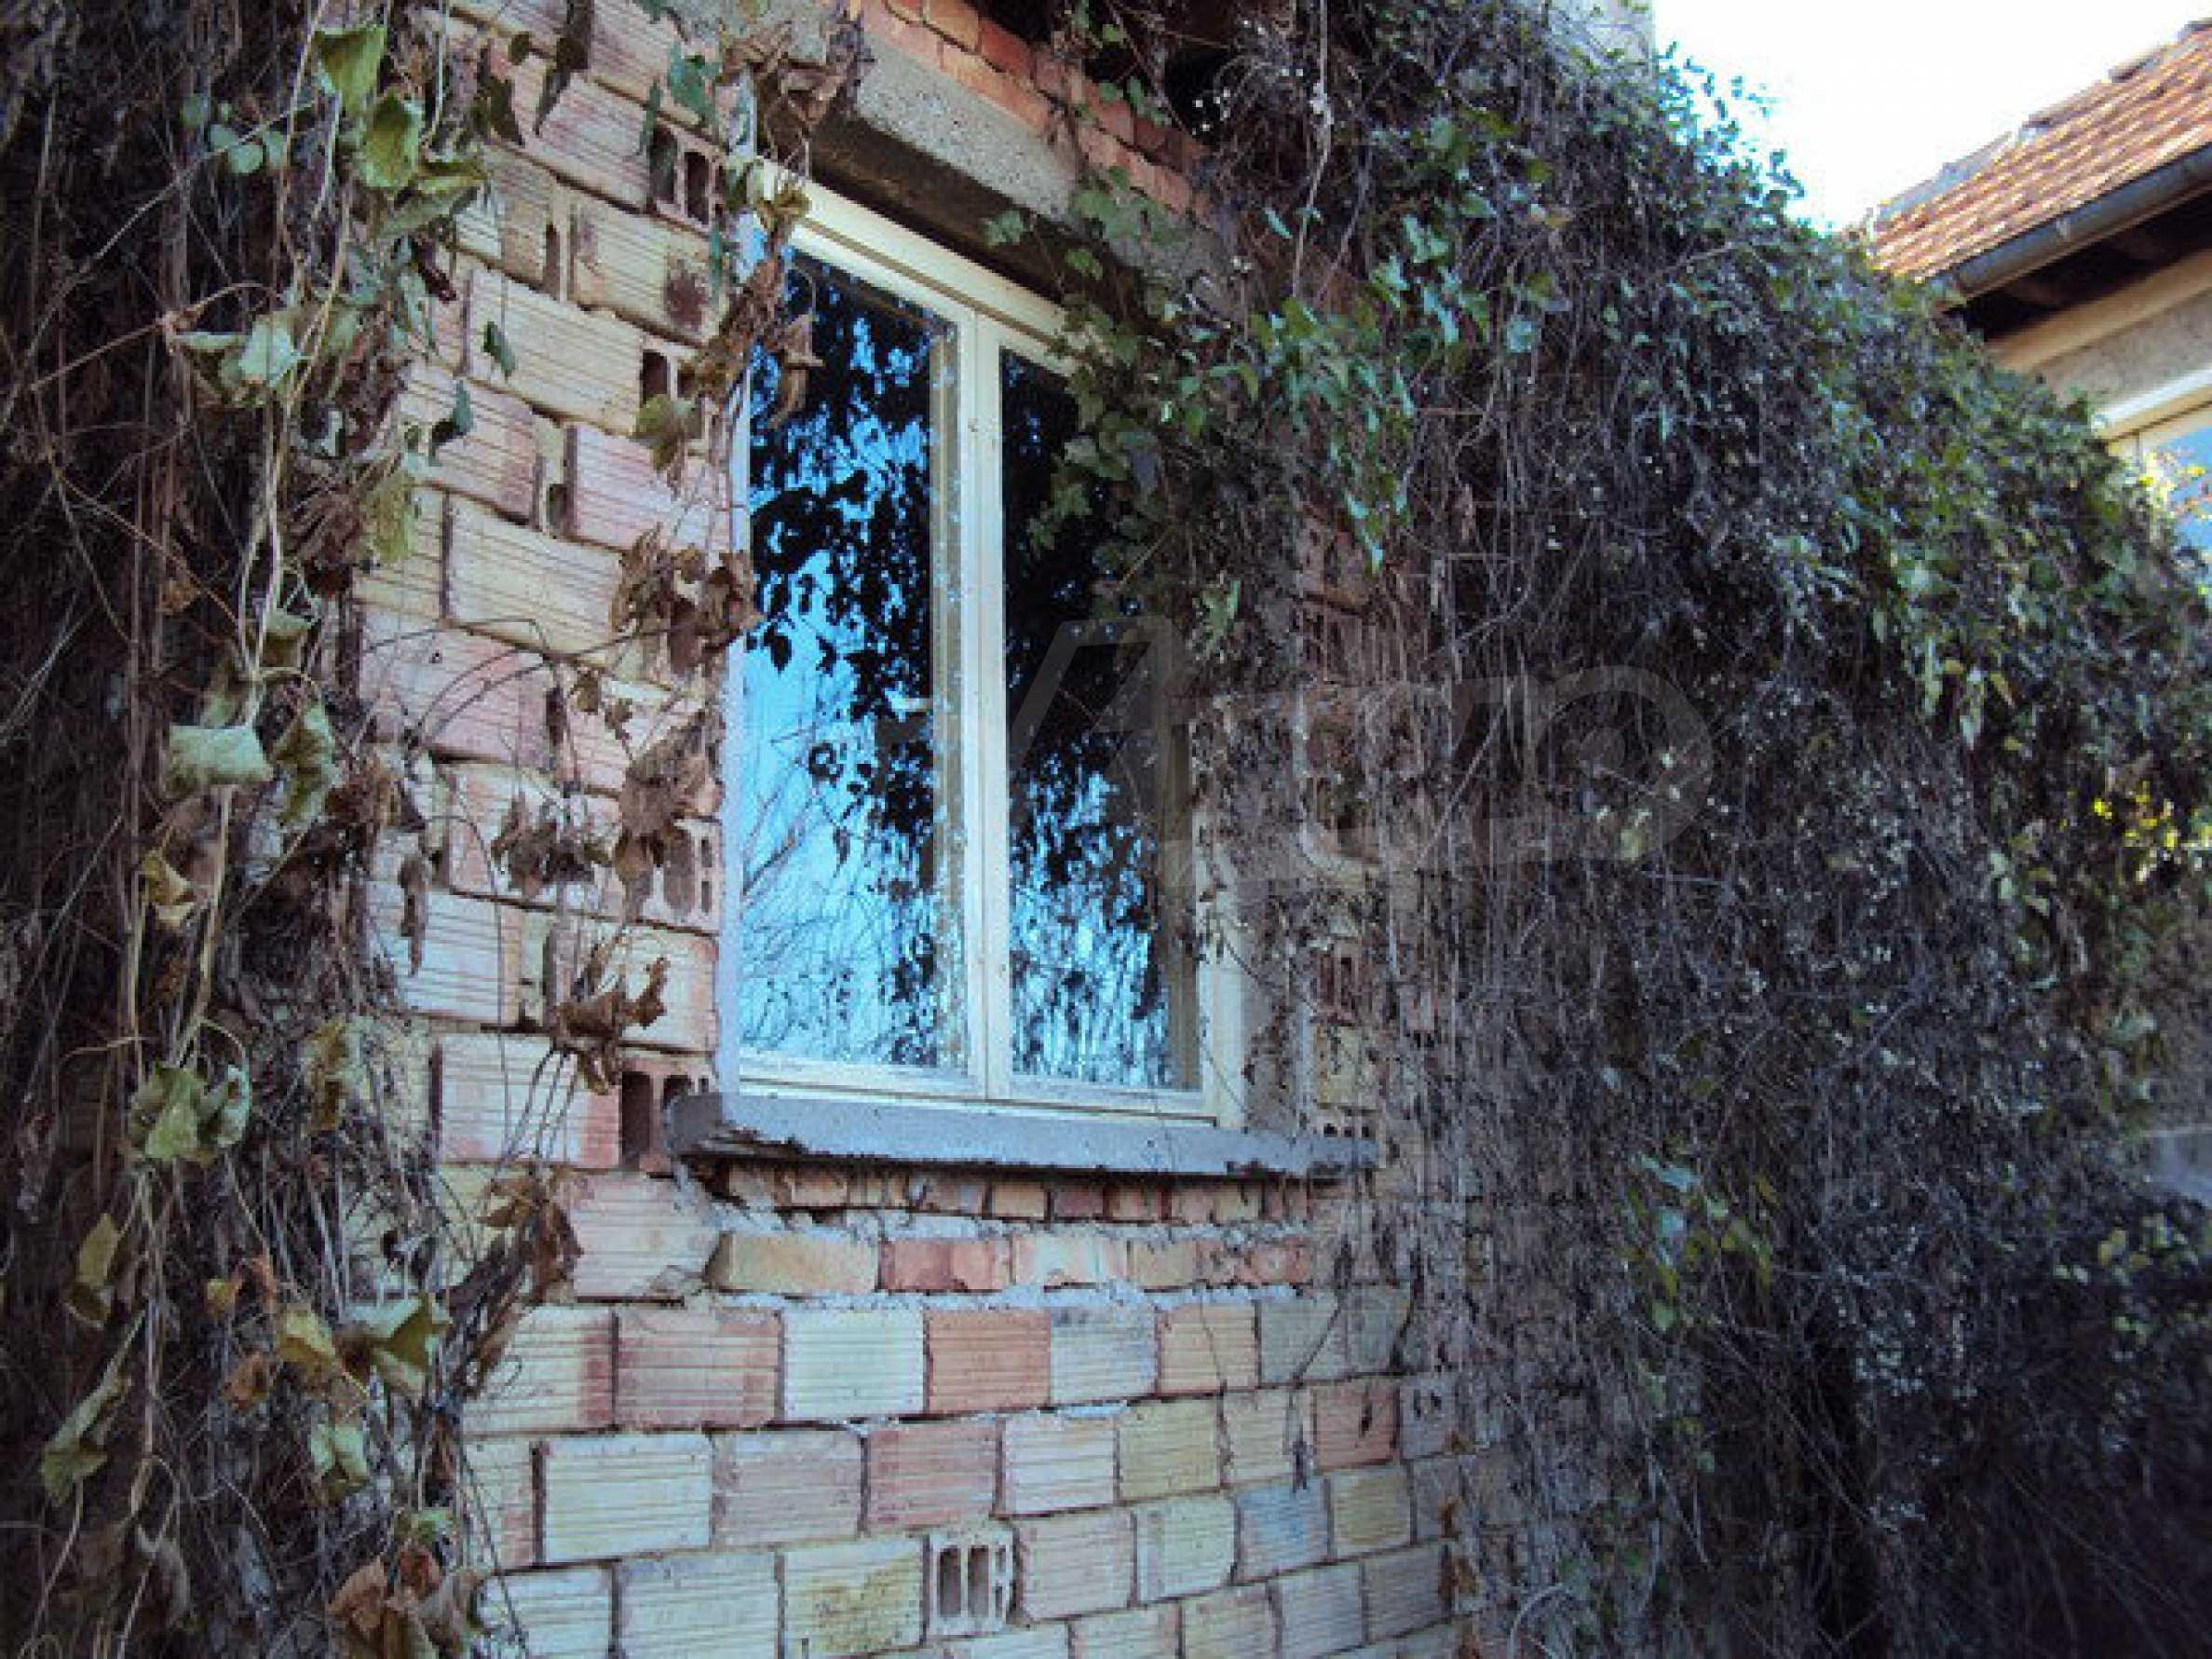 House with garden 25 km away from Veliko Tarnovo 26